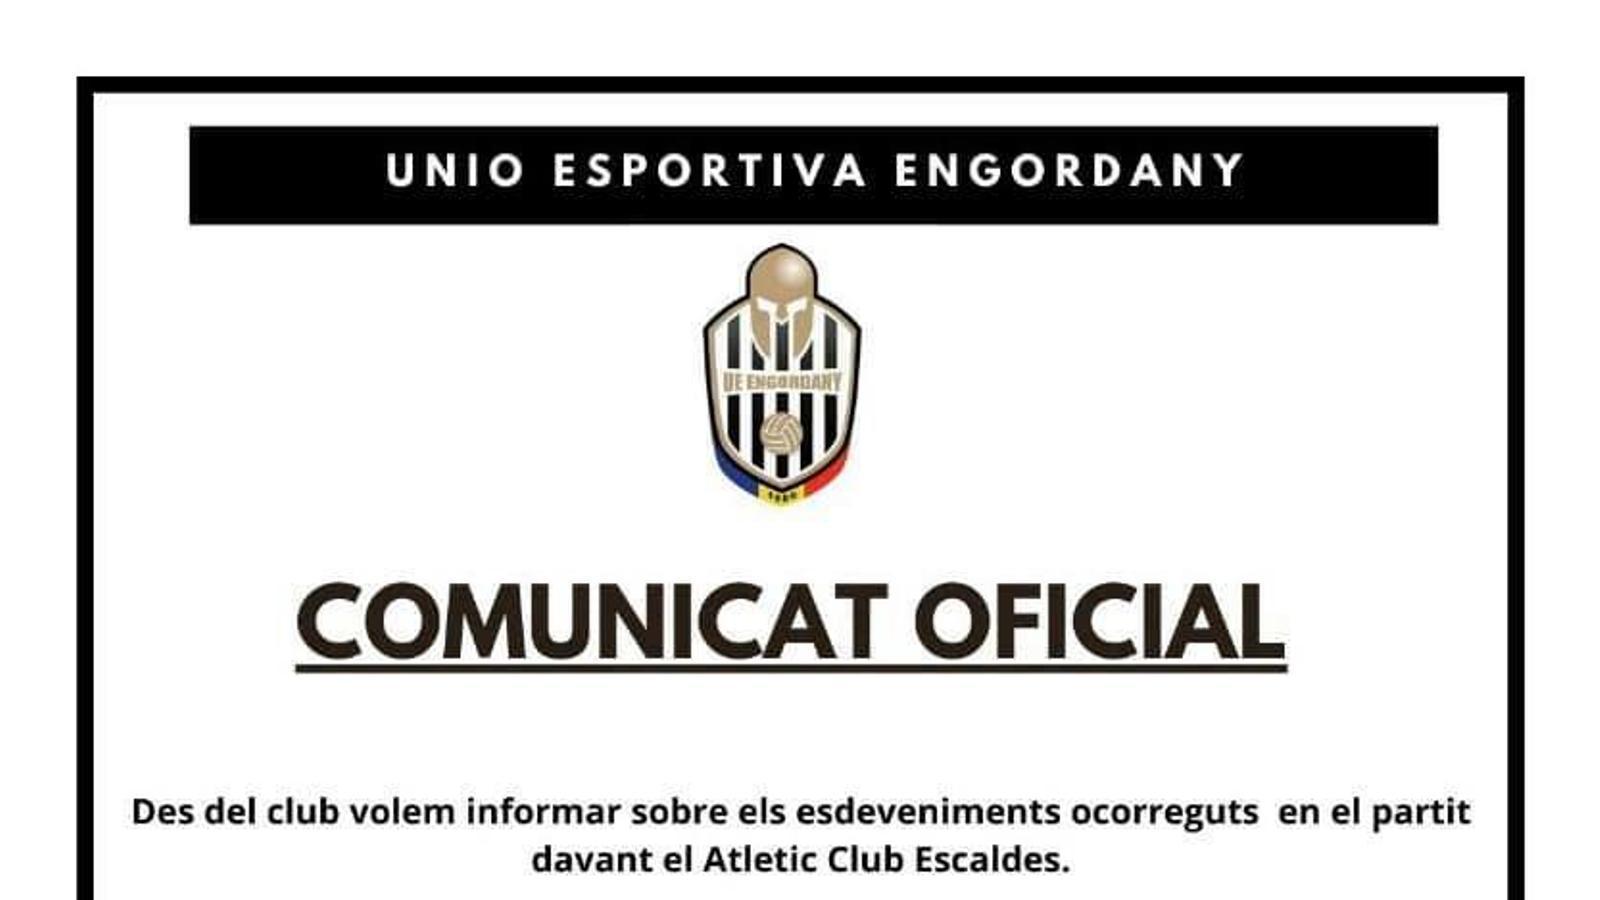 El comunicat oficial de la Unió Esportiva Engordany. / FACEBOOK UE ENGORDANY